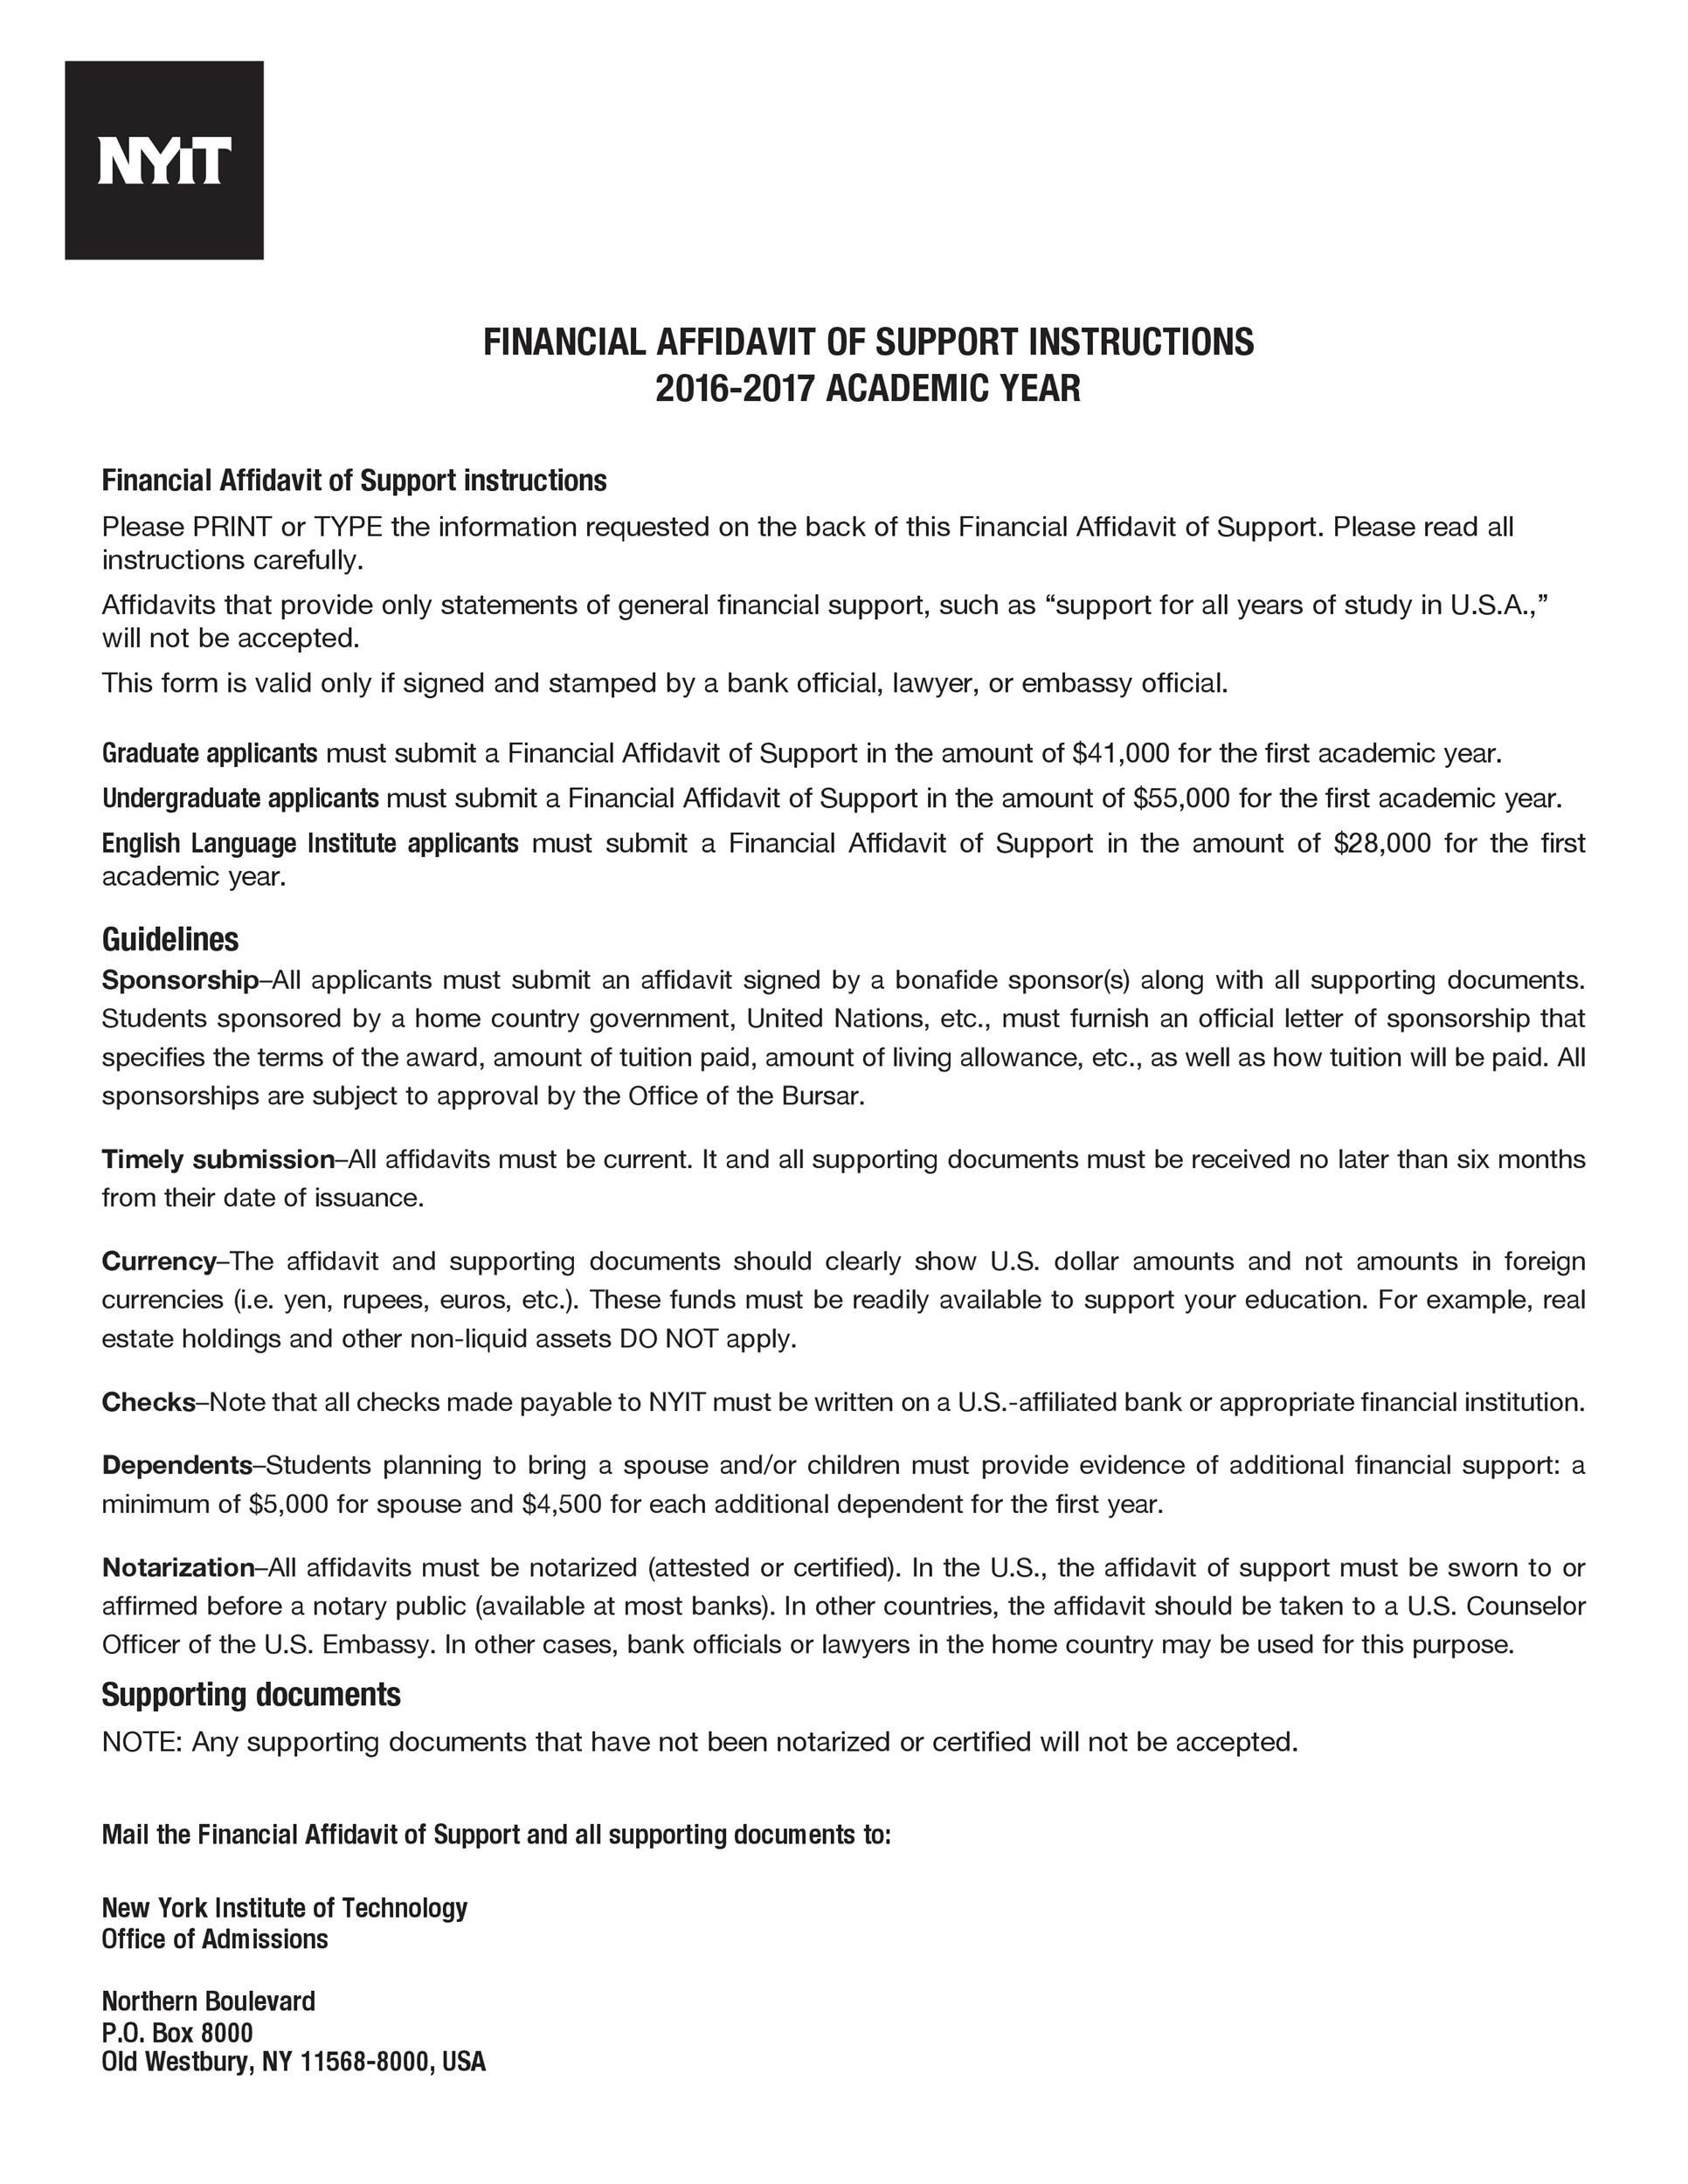 Free affidavit form 09